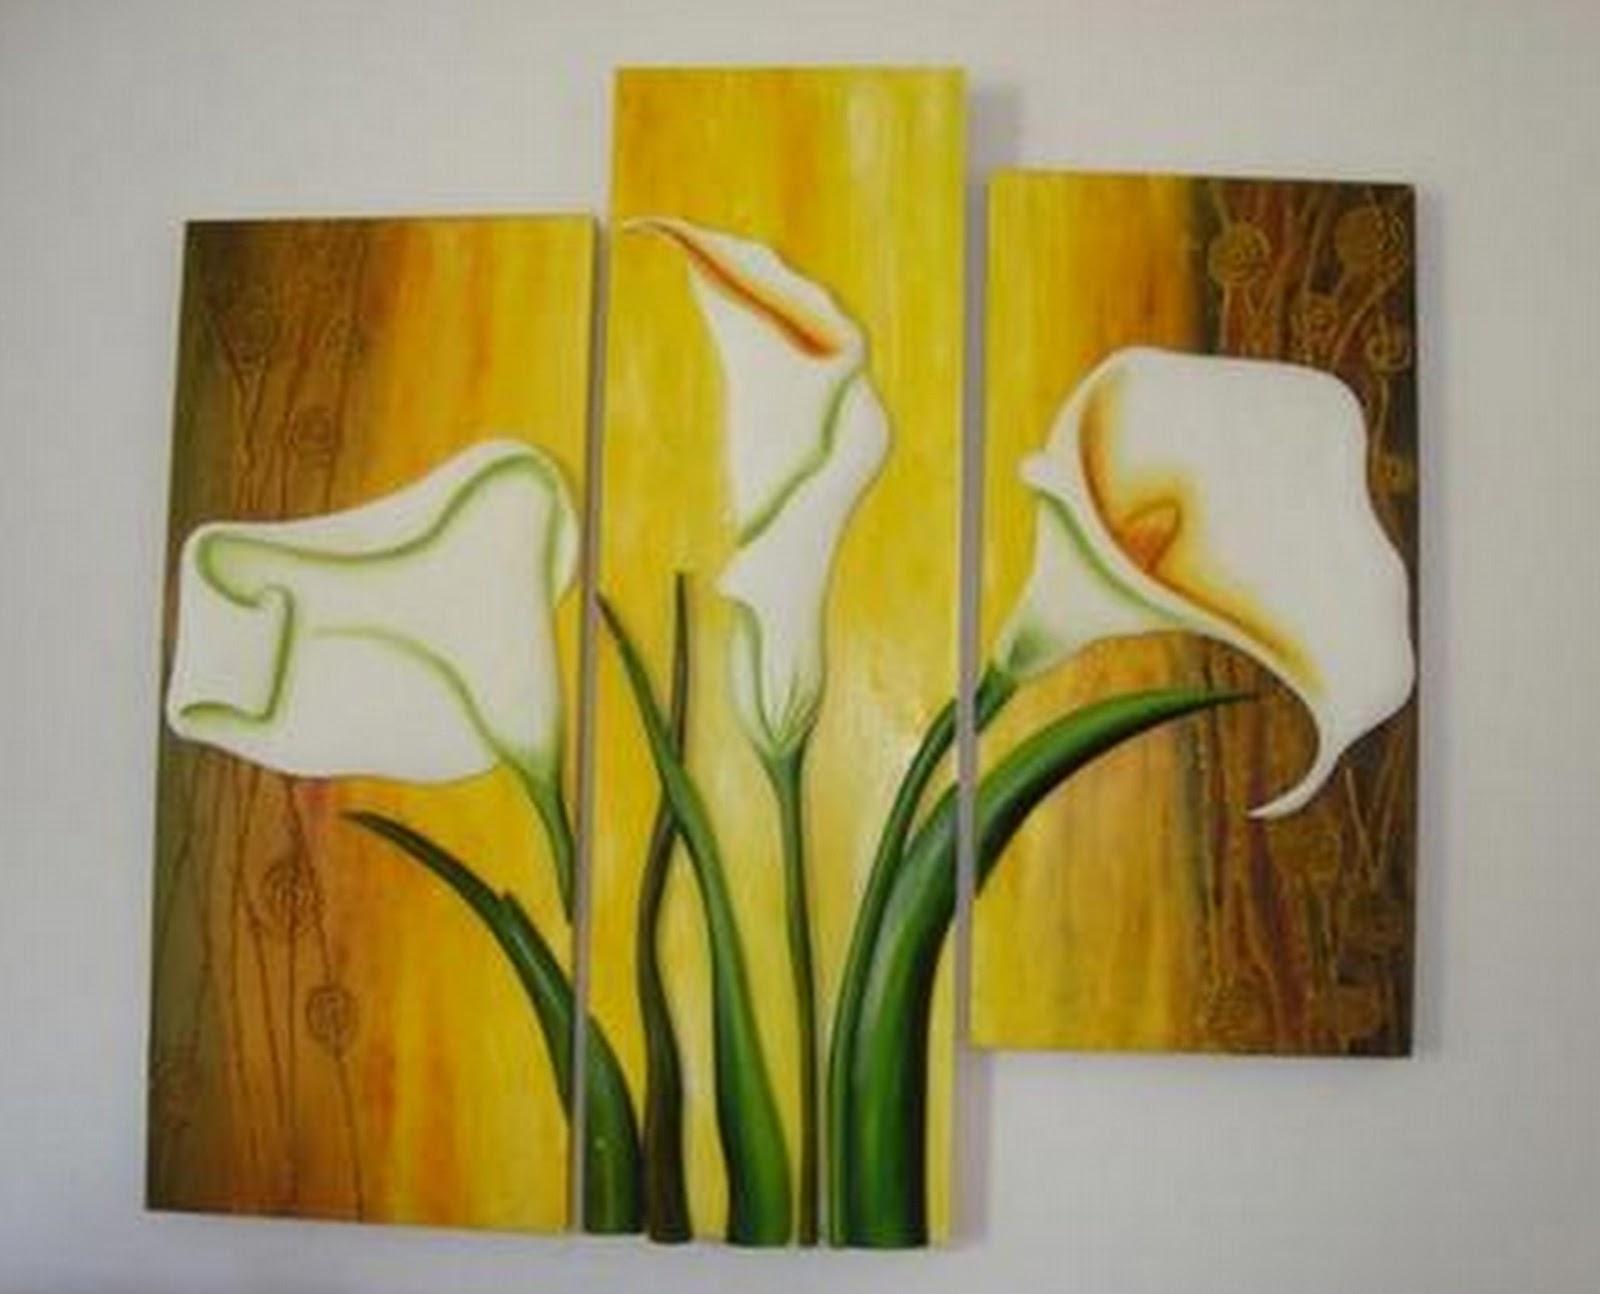 Pinturas cuadros lienzos pinturas tripticos modernos con flores - Triptico cuadros modernos ...